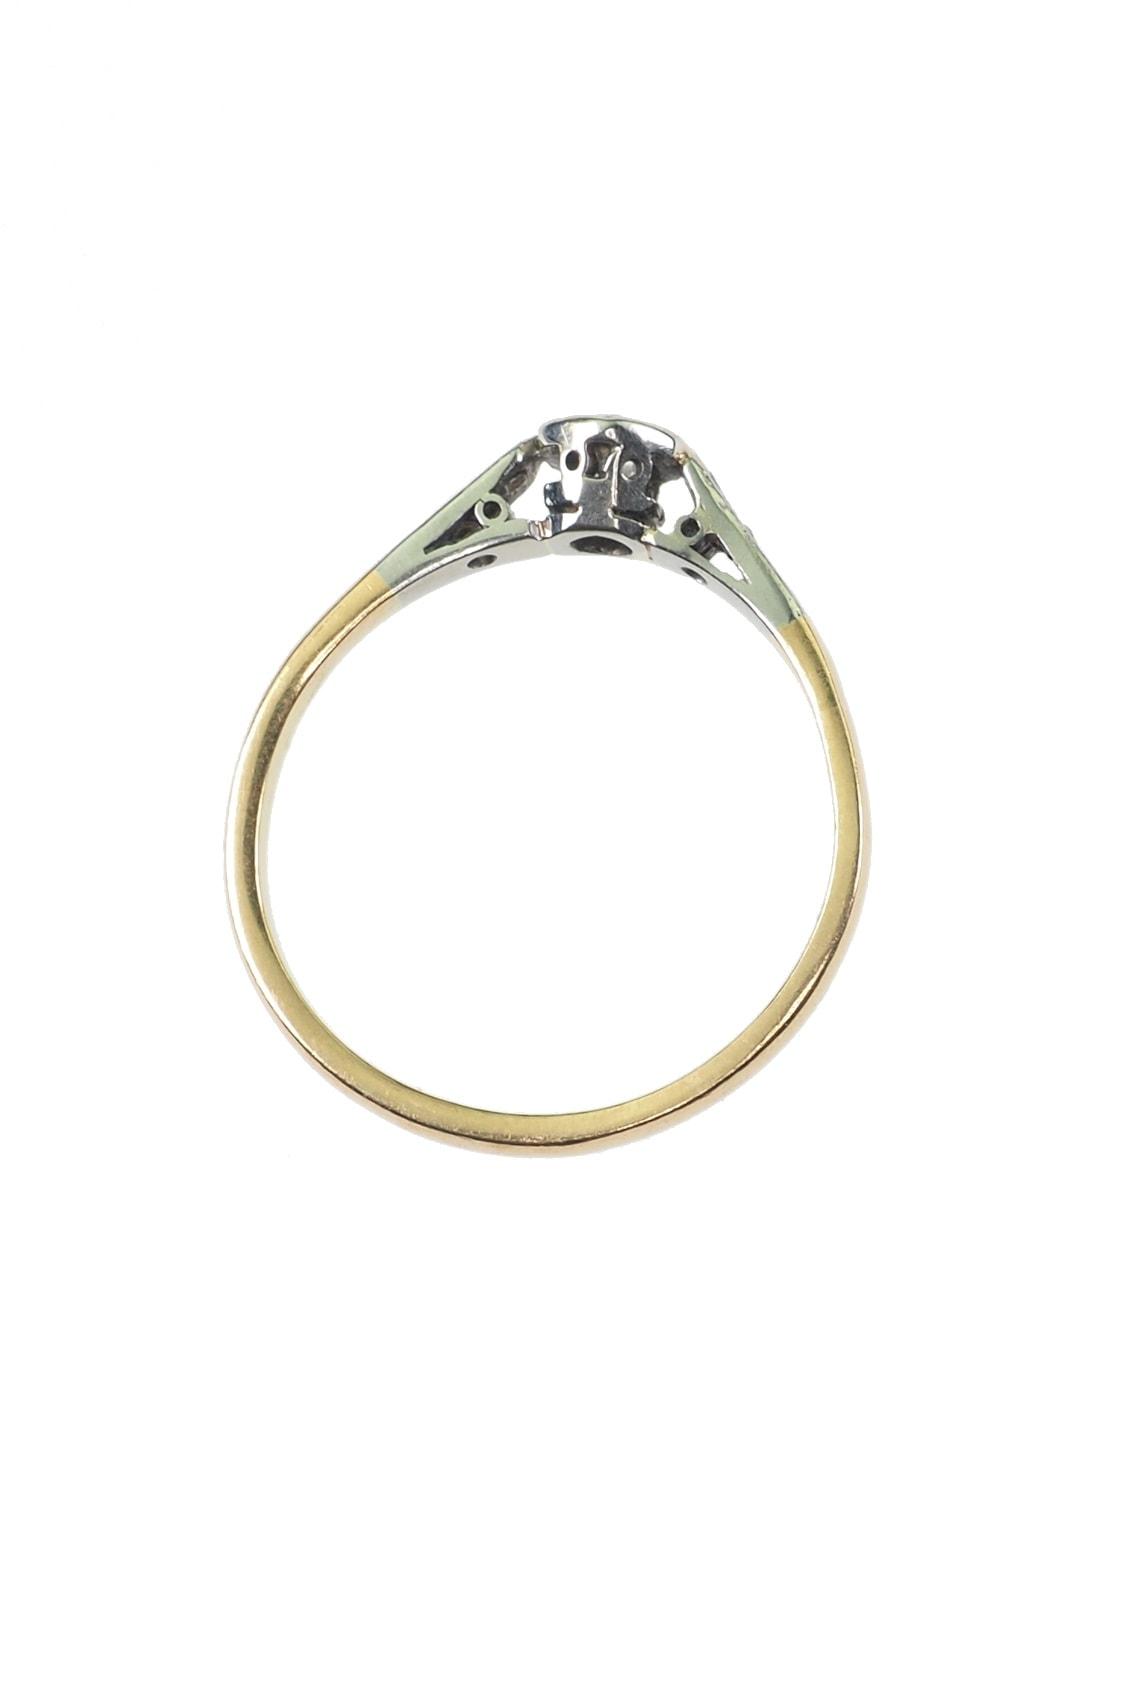 antike-Verlobungsringe-kaufen-2686b